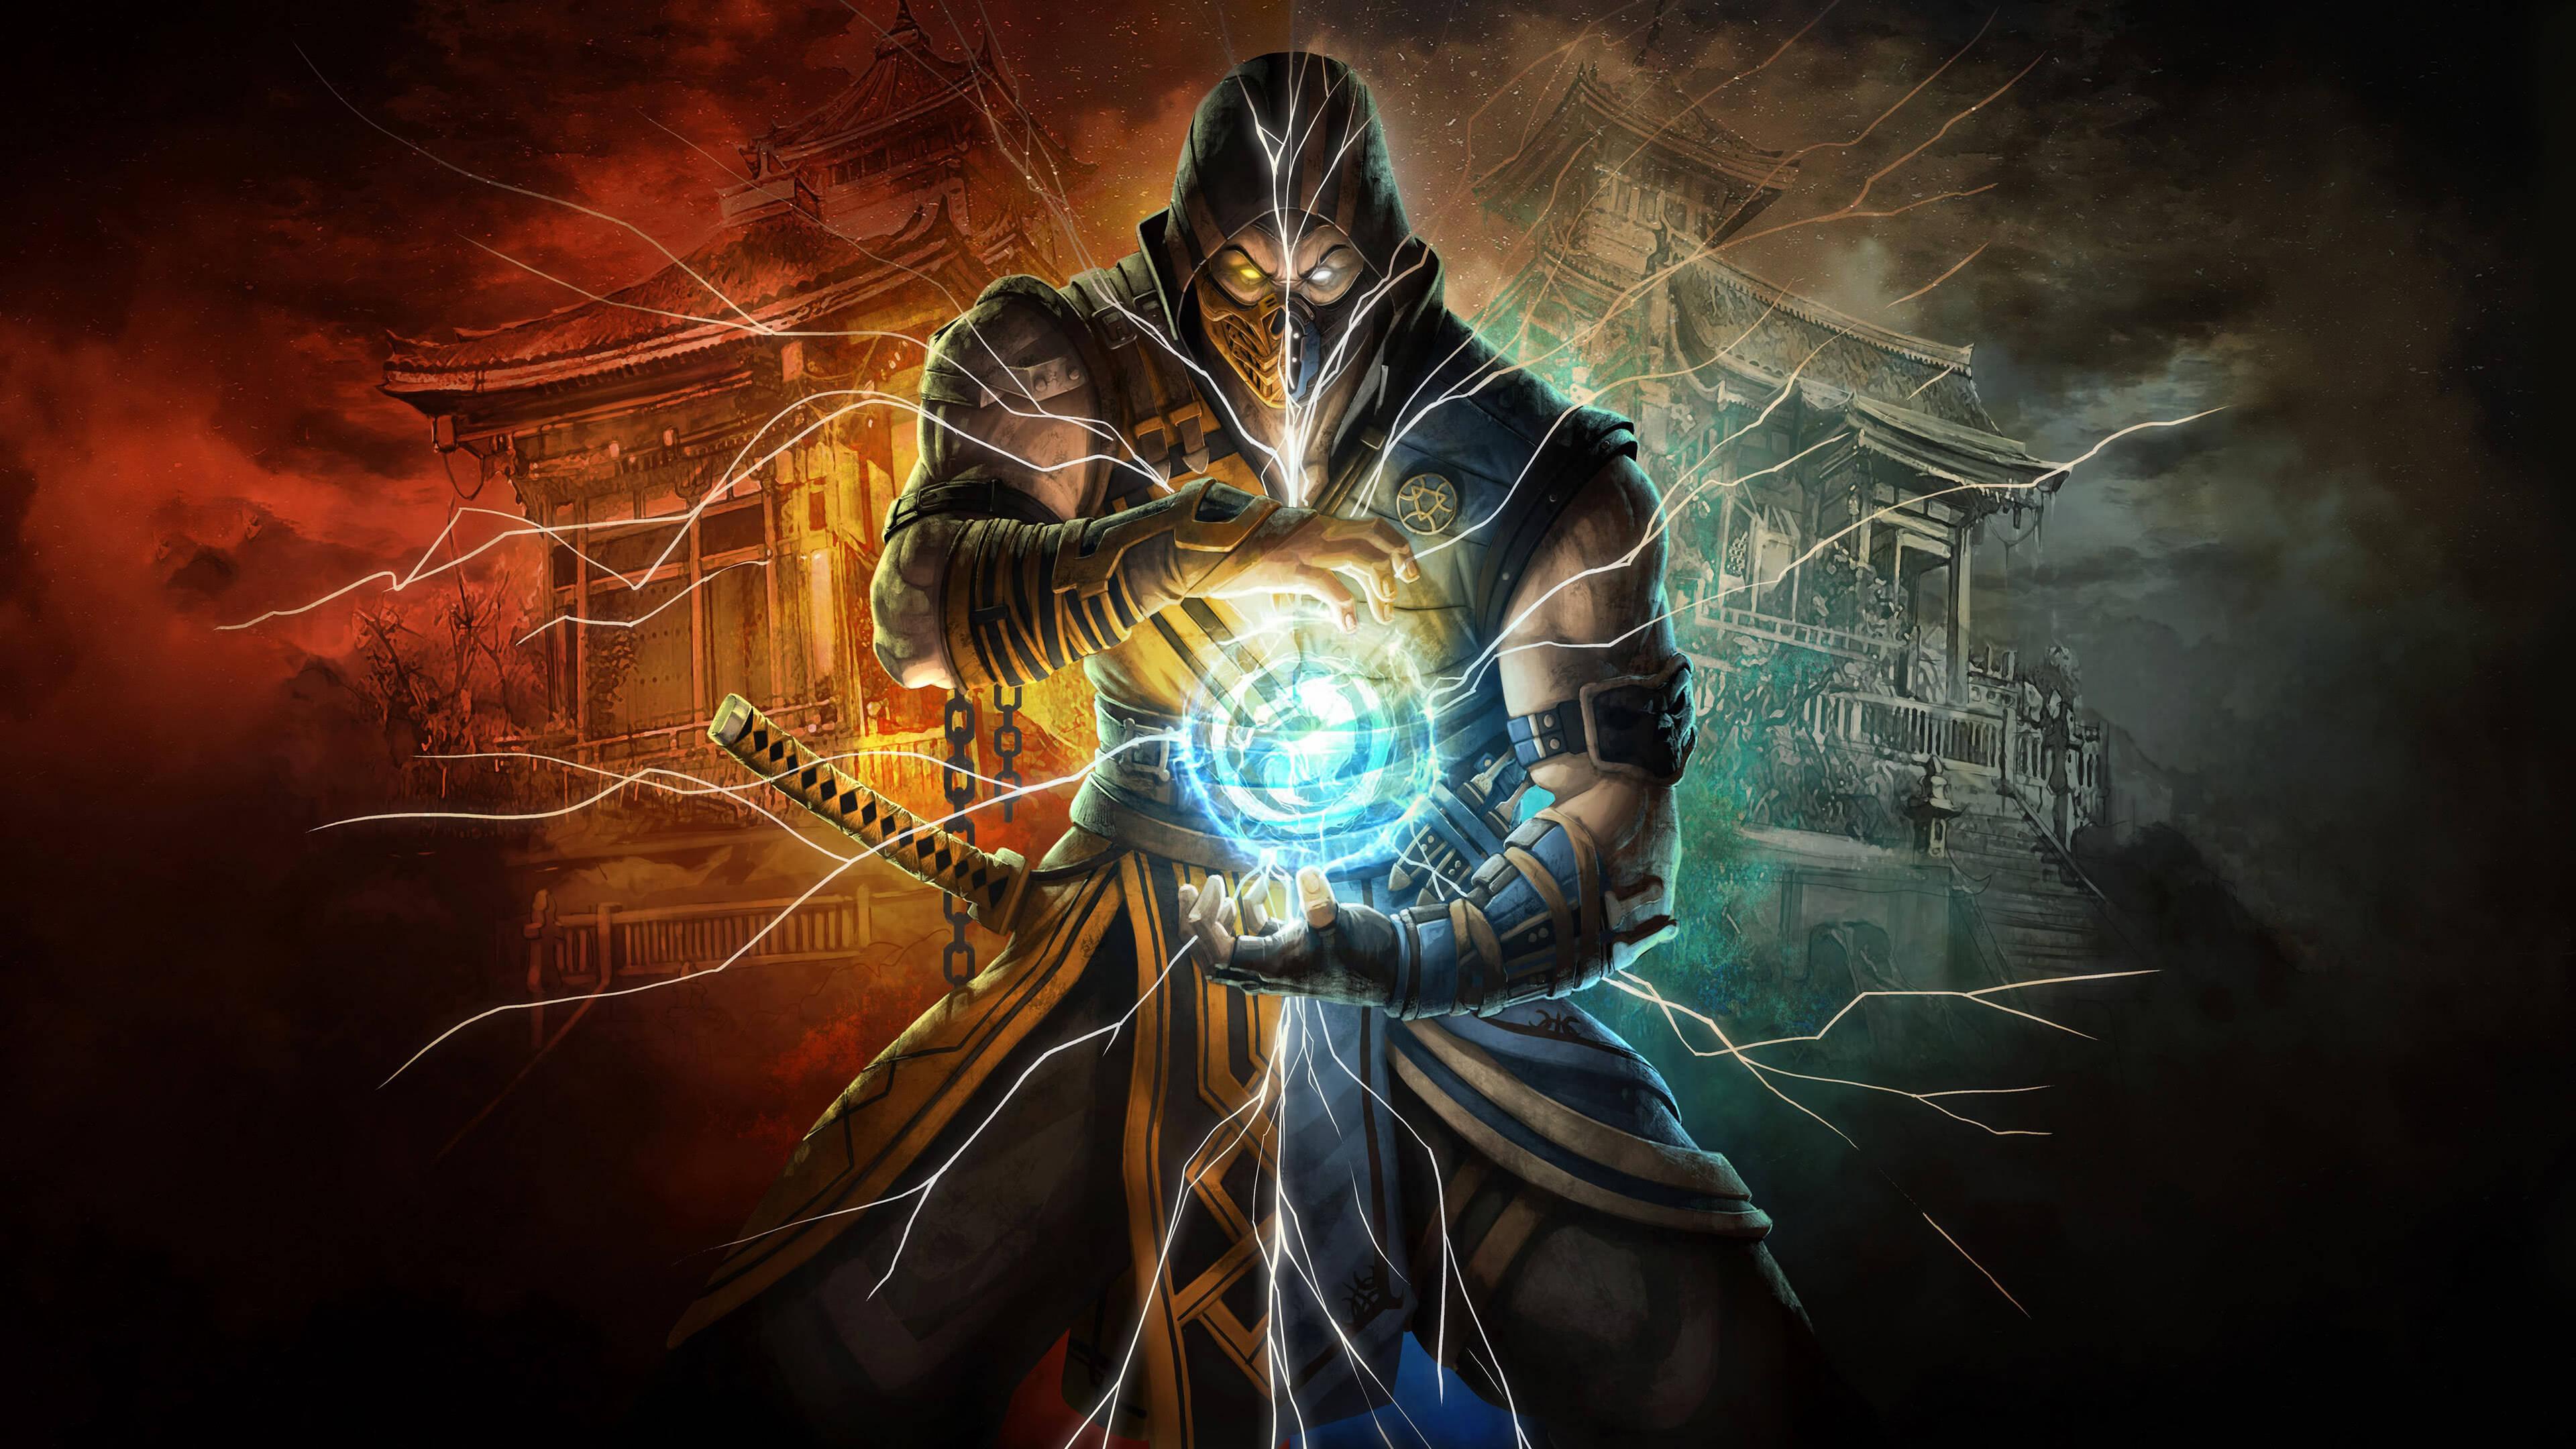 Mortal Kombat Scorpion Subzero UHD 4K